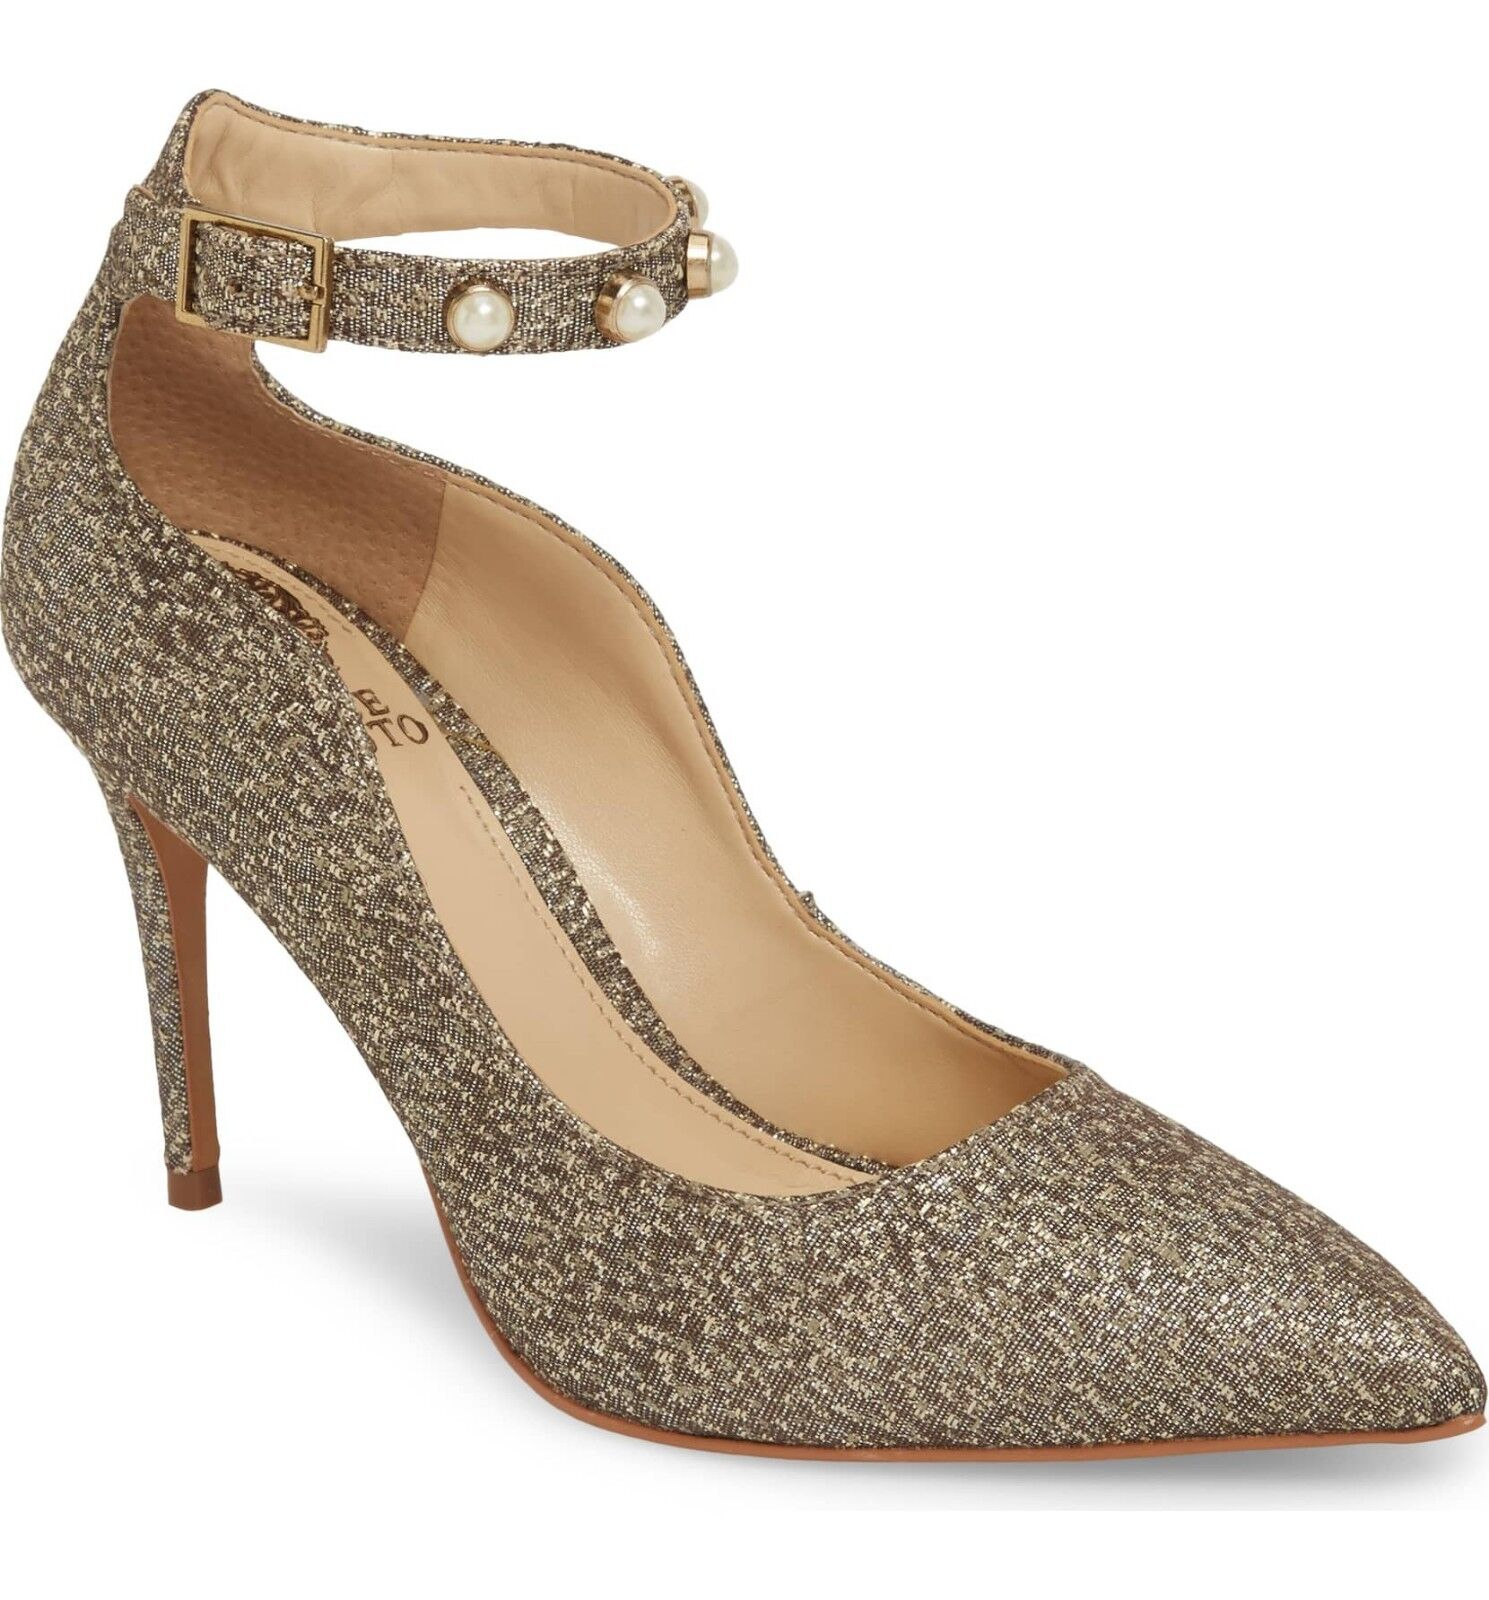 huge discount 79646 3eefa 8M VINCE CAMUTO VC-JASSITA JASSITA BRONZE femmes PUMP PUMP PUMP chaussures  ANKLE STRAP PEARLS